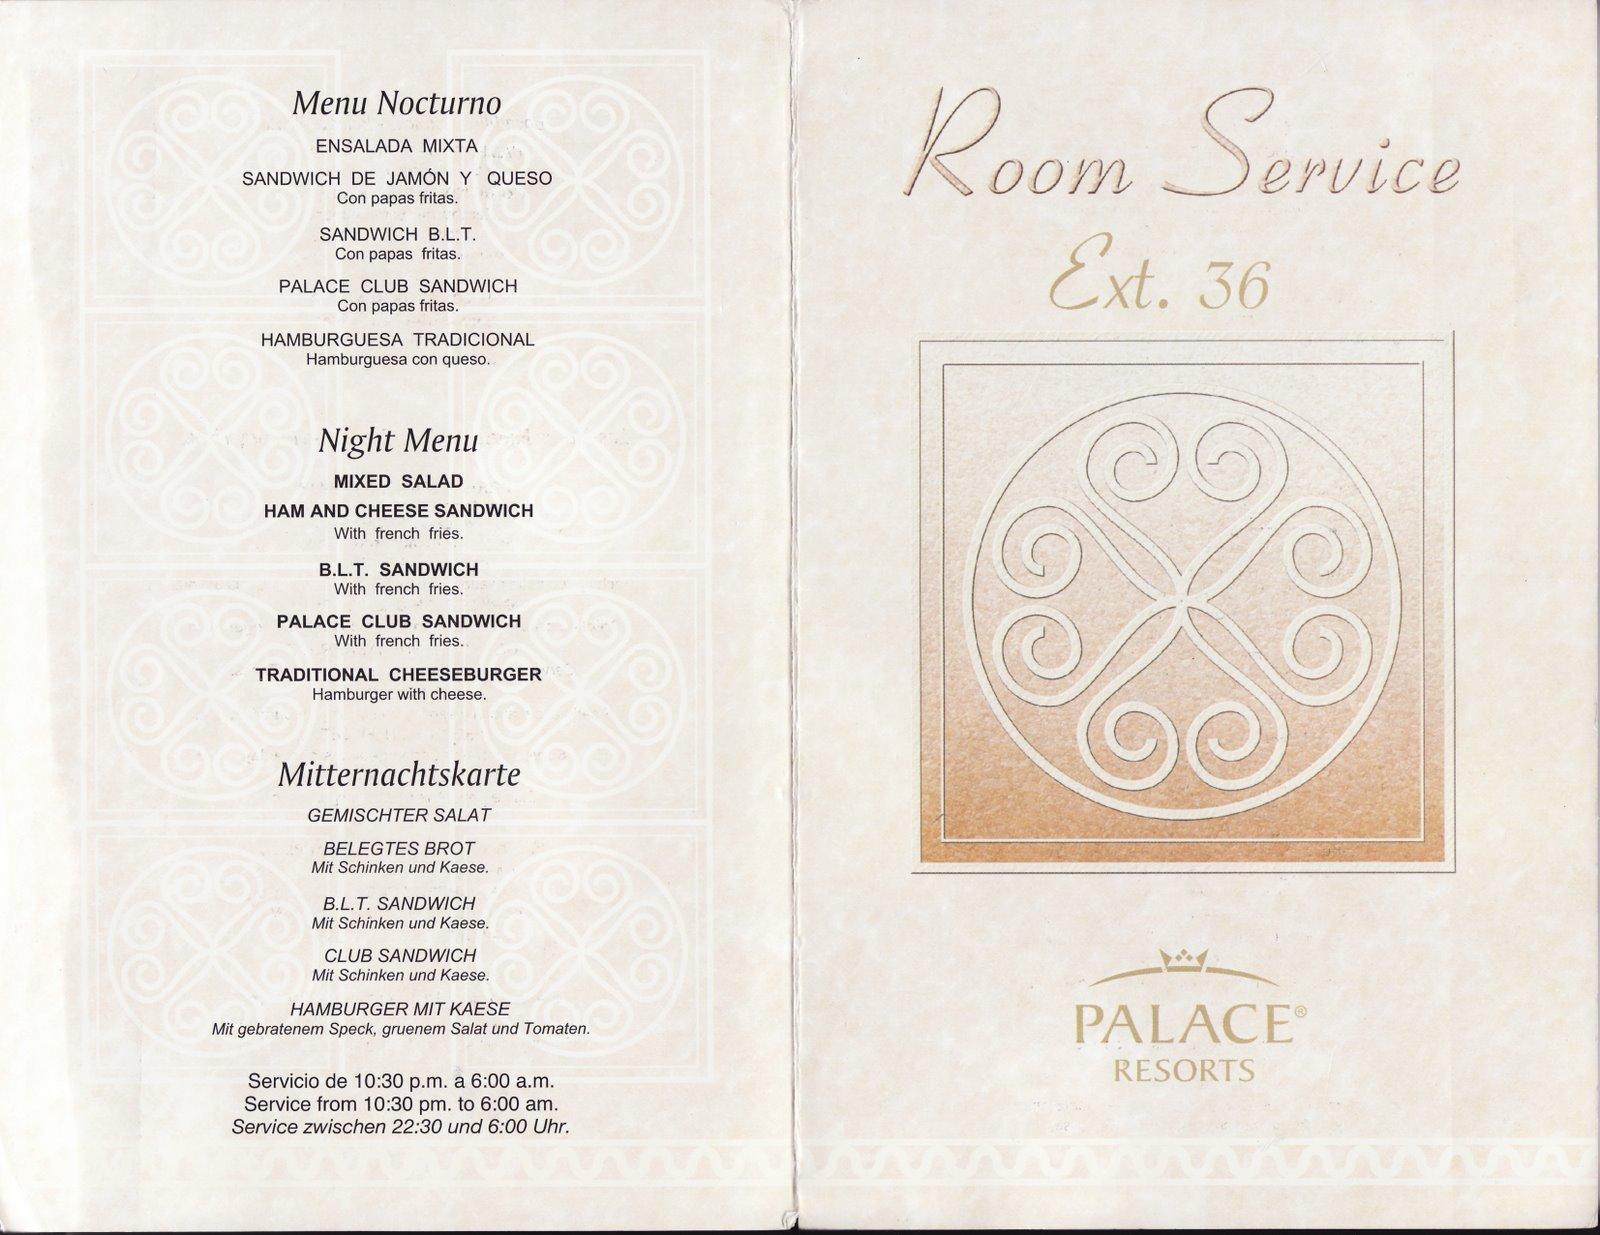 Playacar Palace Room Service Menu